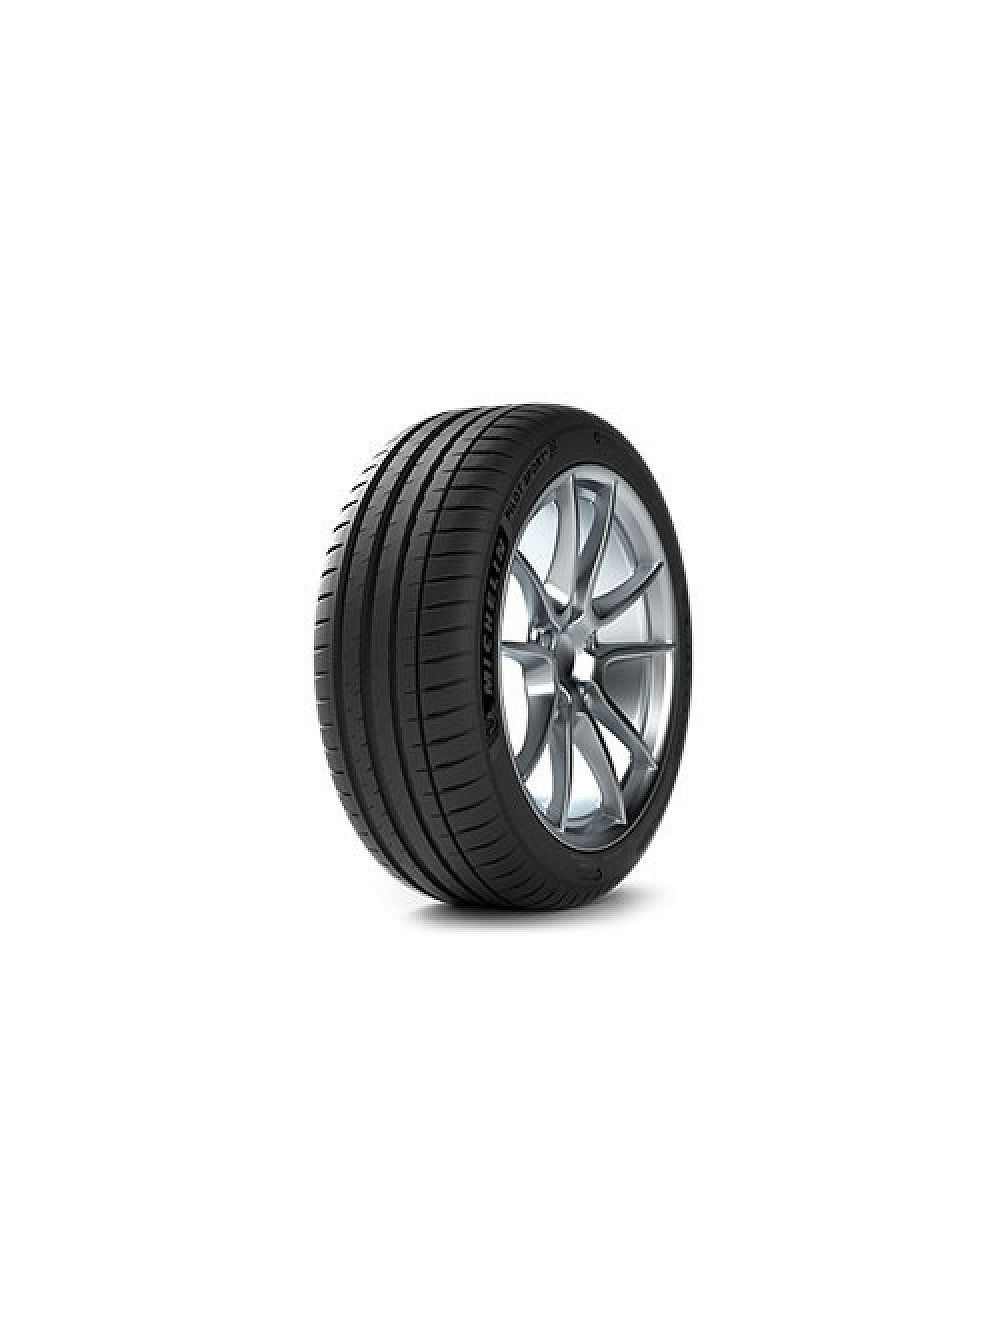 Michelin 255/35R19 Y Pilot Sport4 S XL Nyári gumi